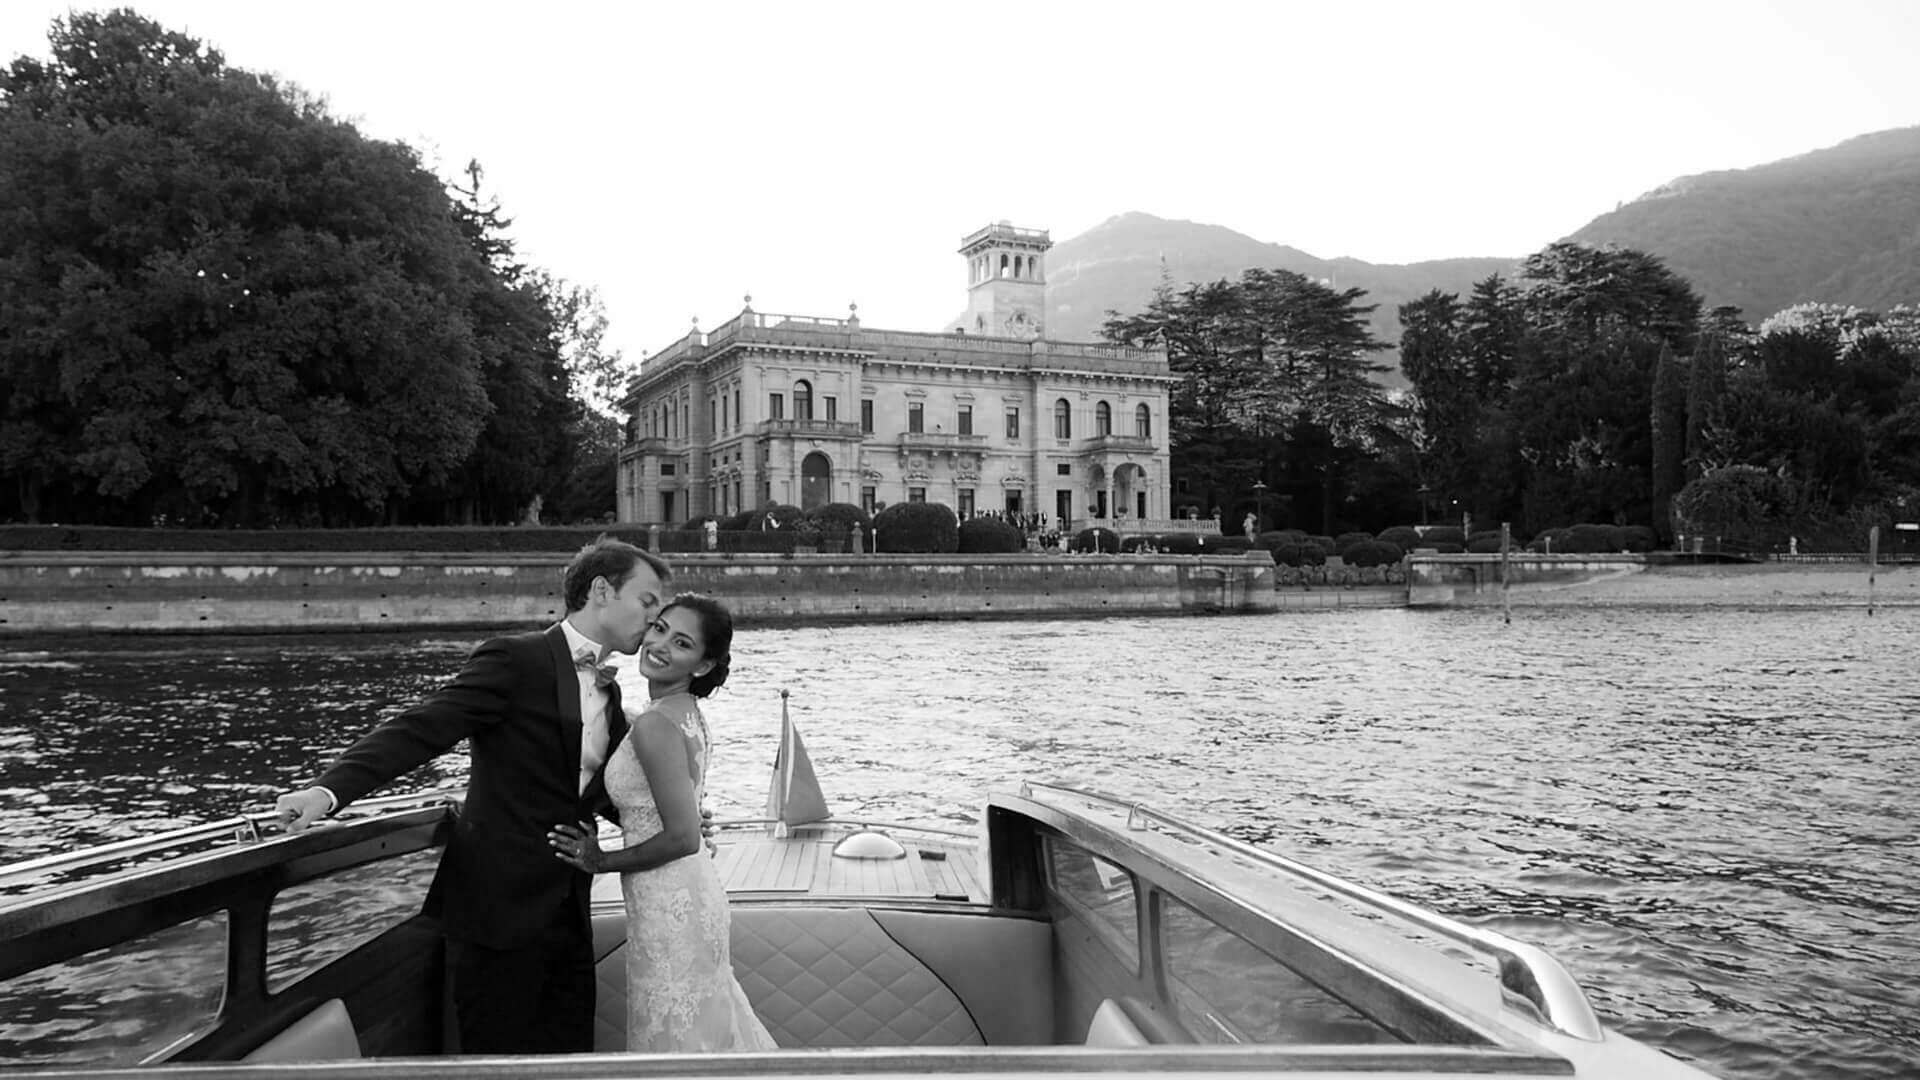 bride-groom-villa-erba-como-lake-journal.jpg